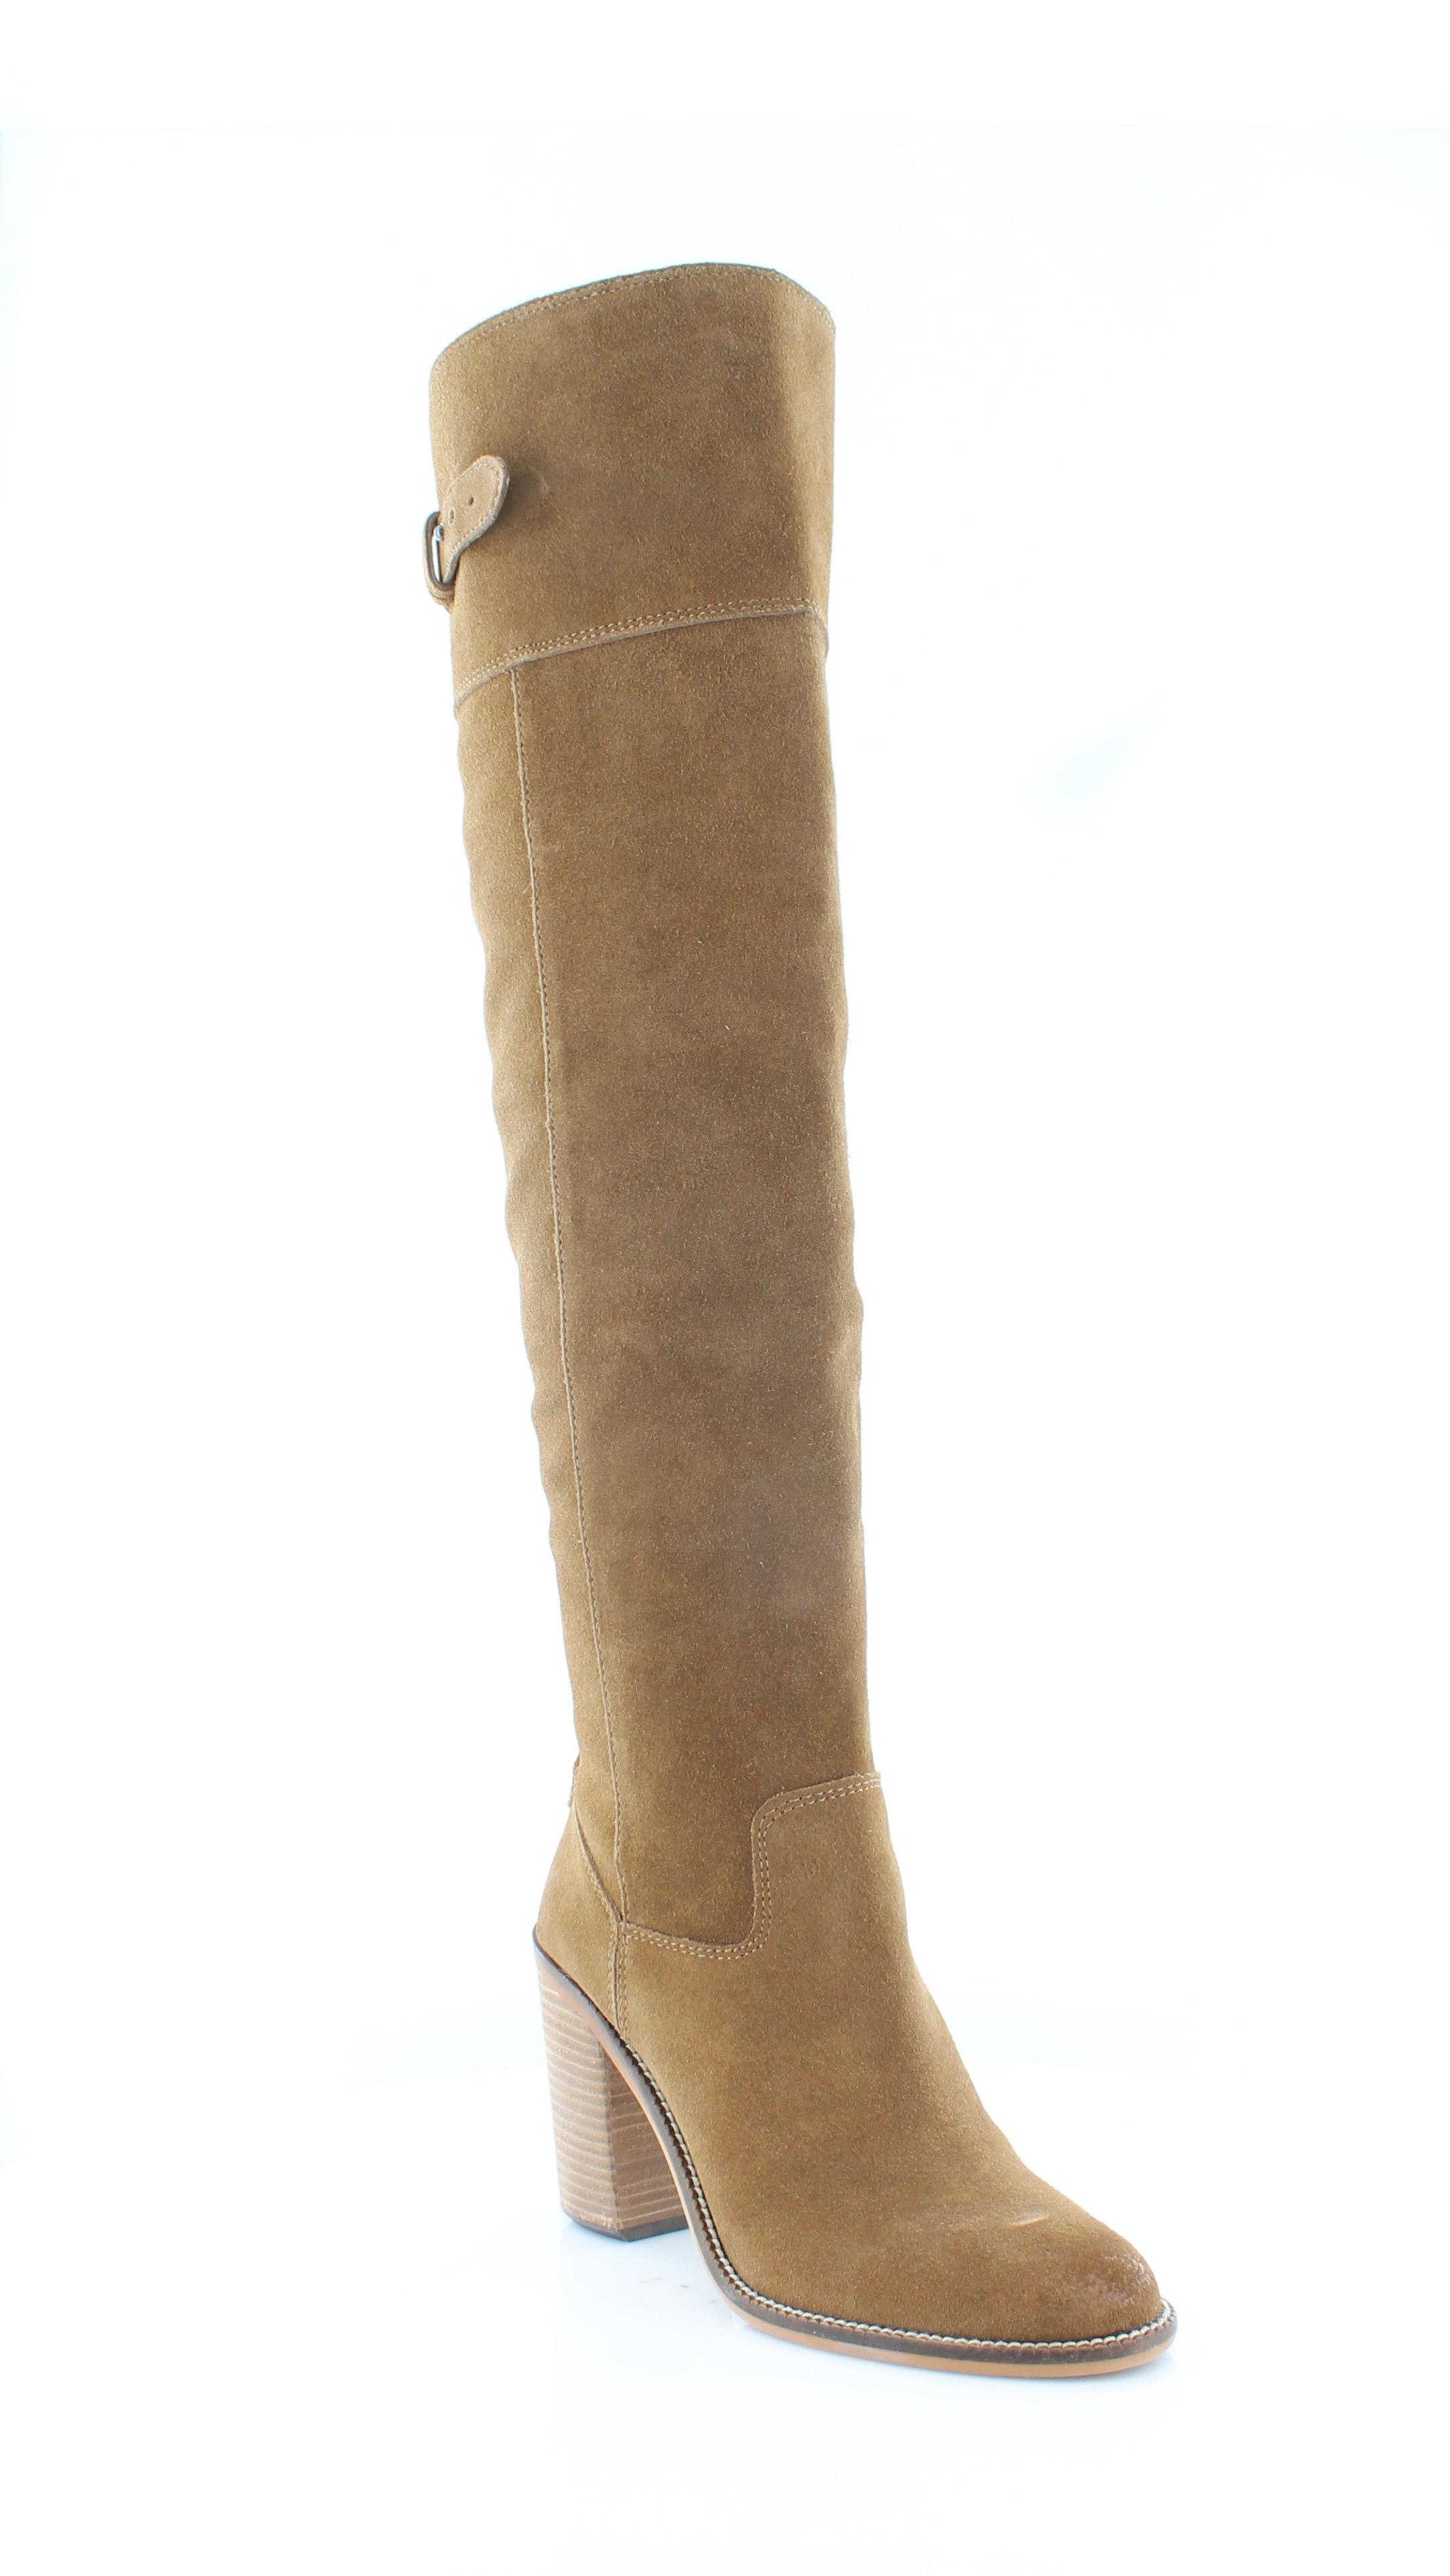 Dolce Vita Okana Women's Boots Saddle Size 8 M